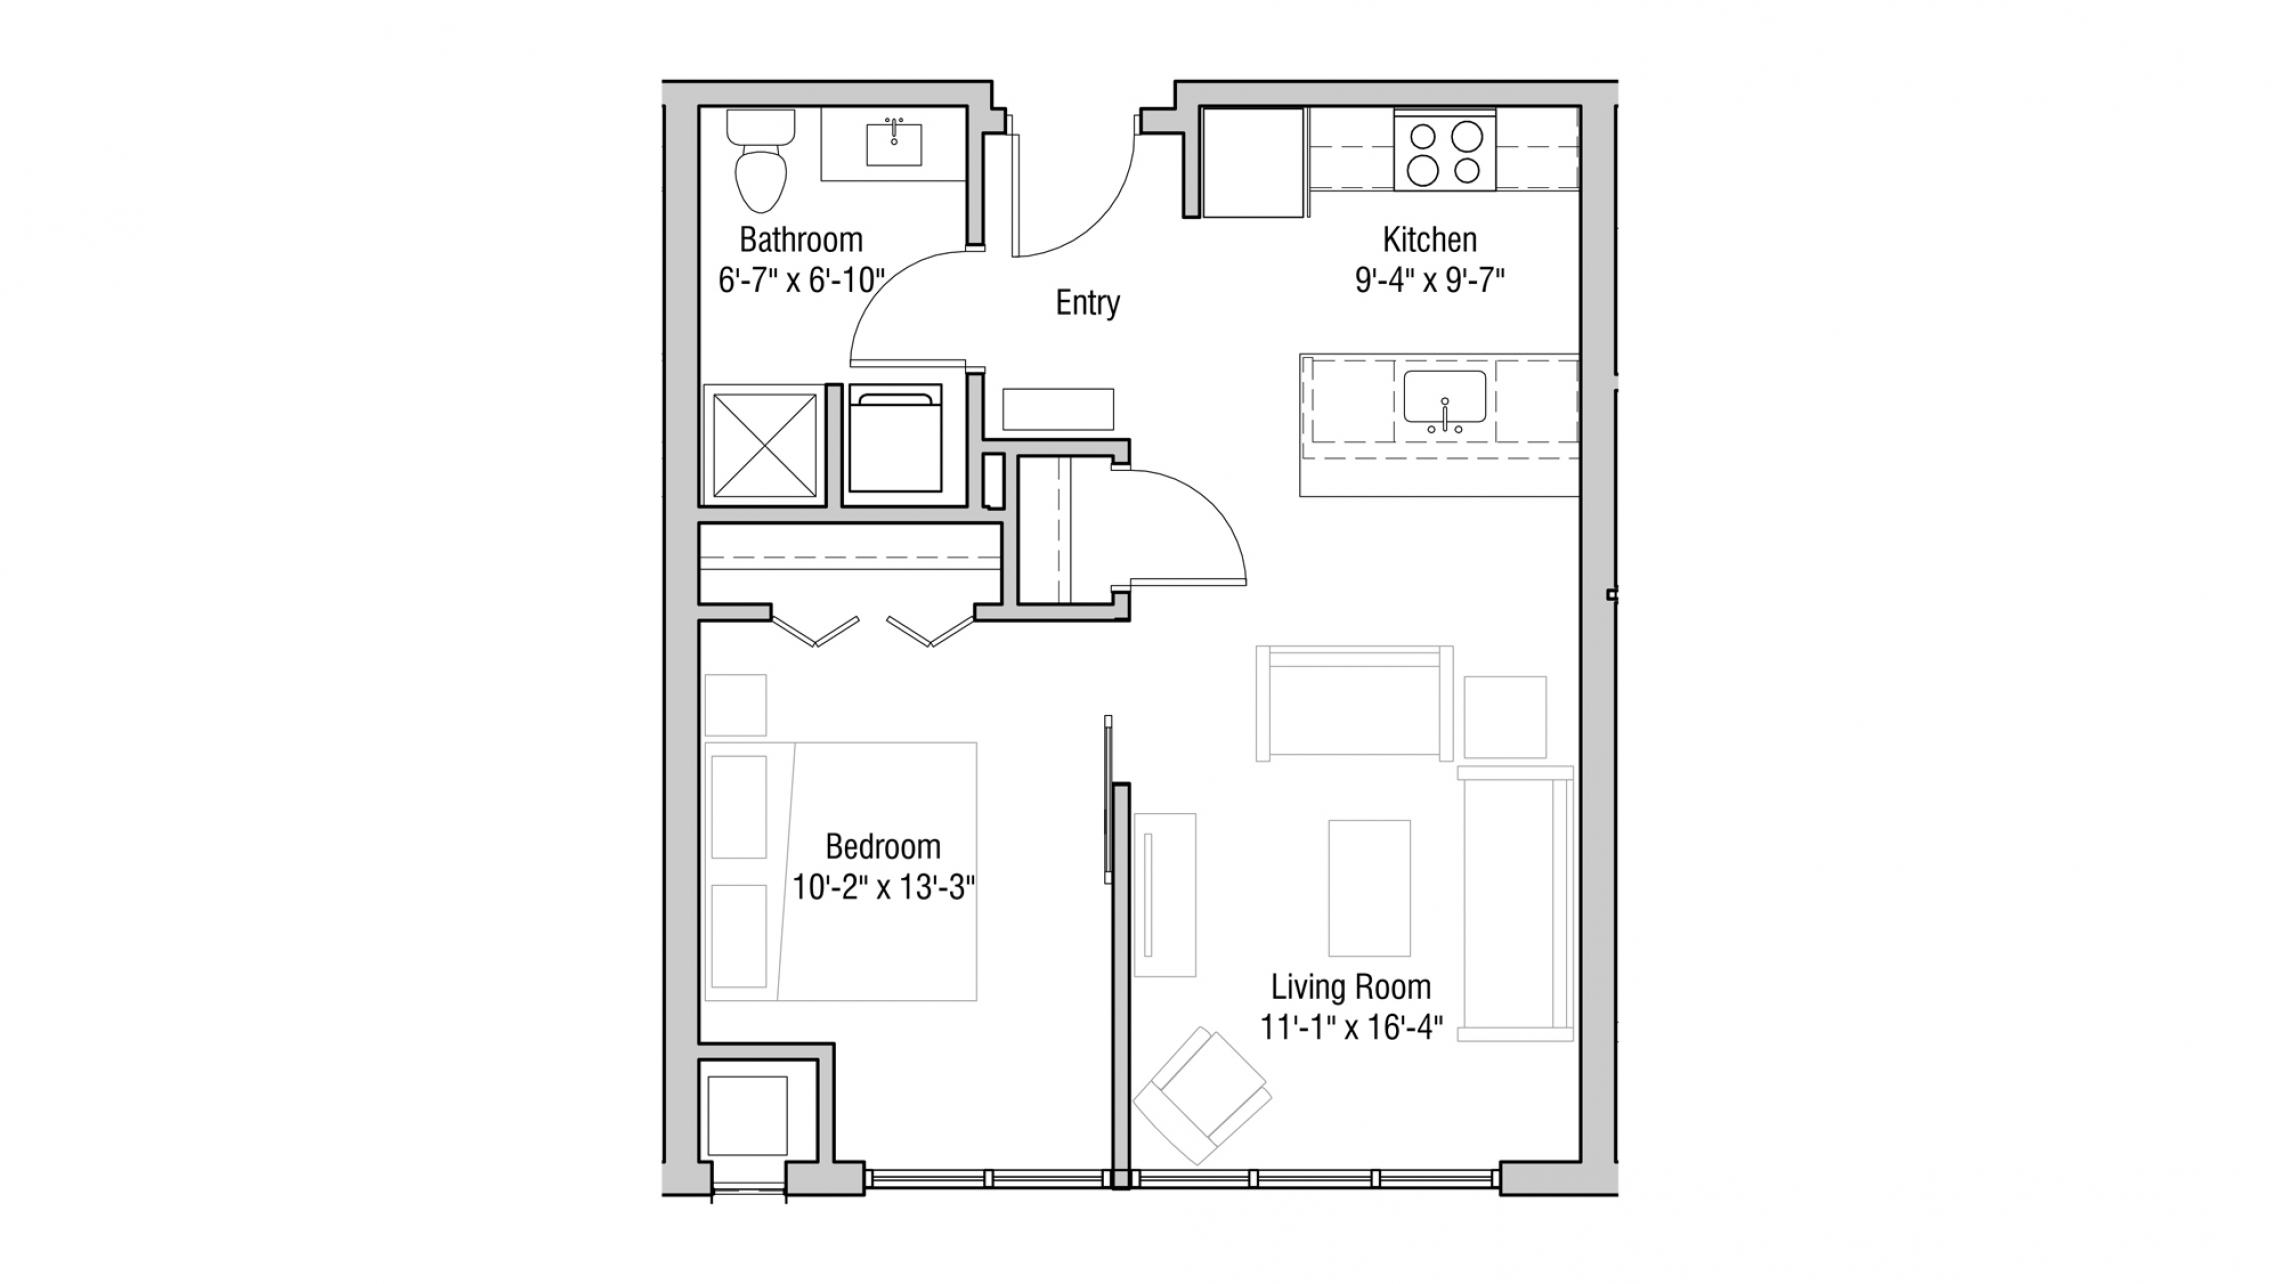 ULI Quarter Row 424 - One Bedroom, One Bathroom